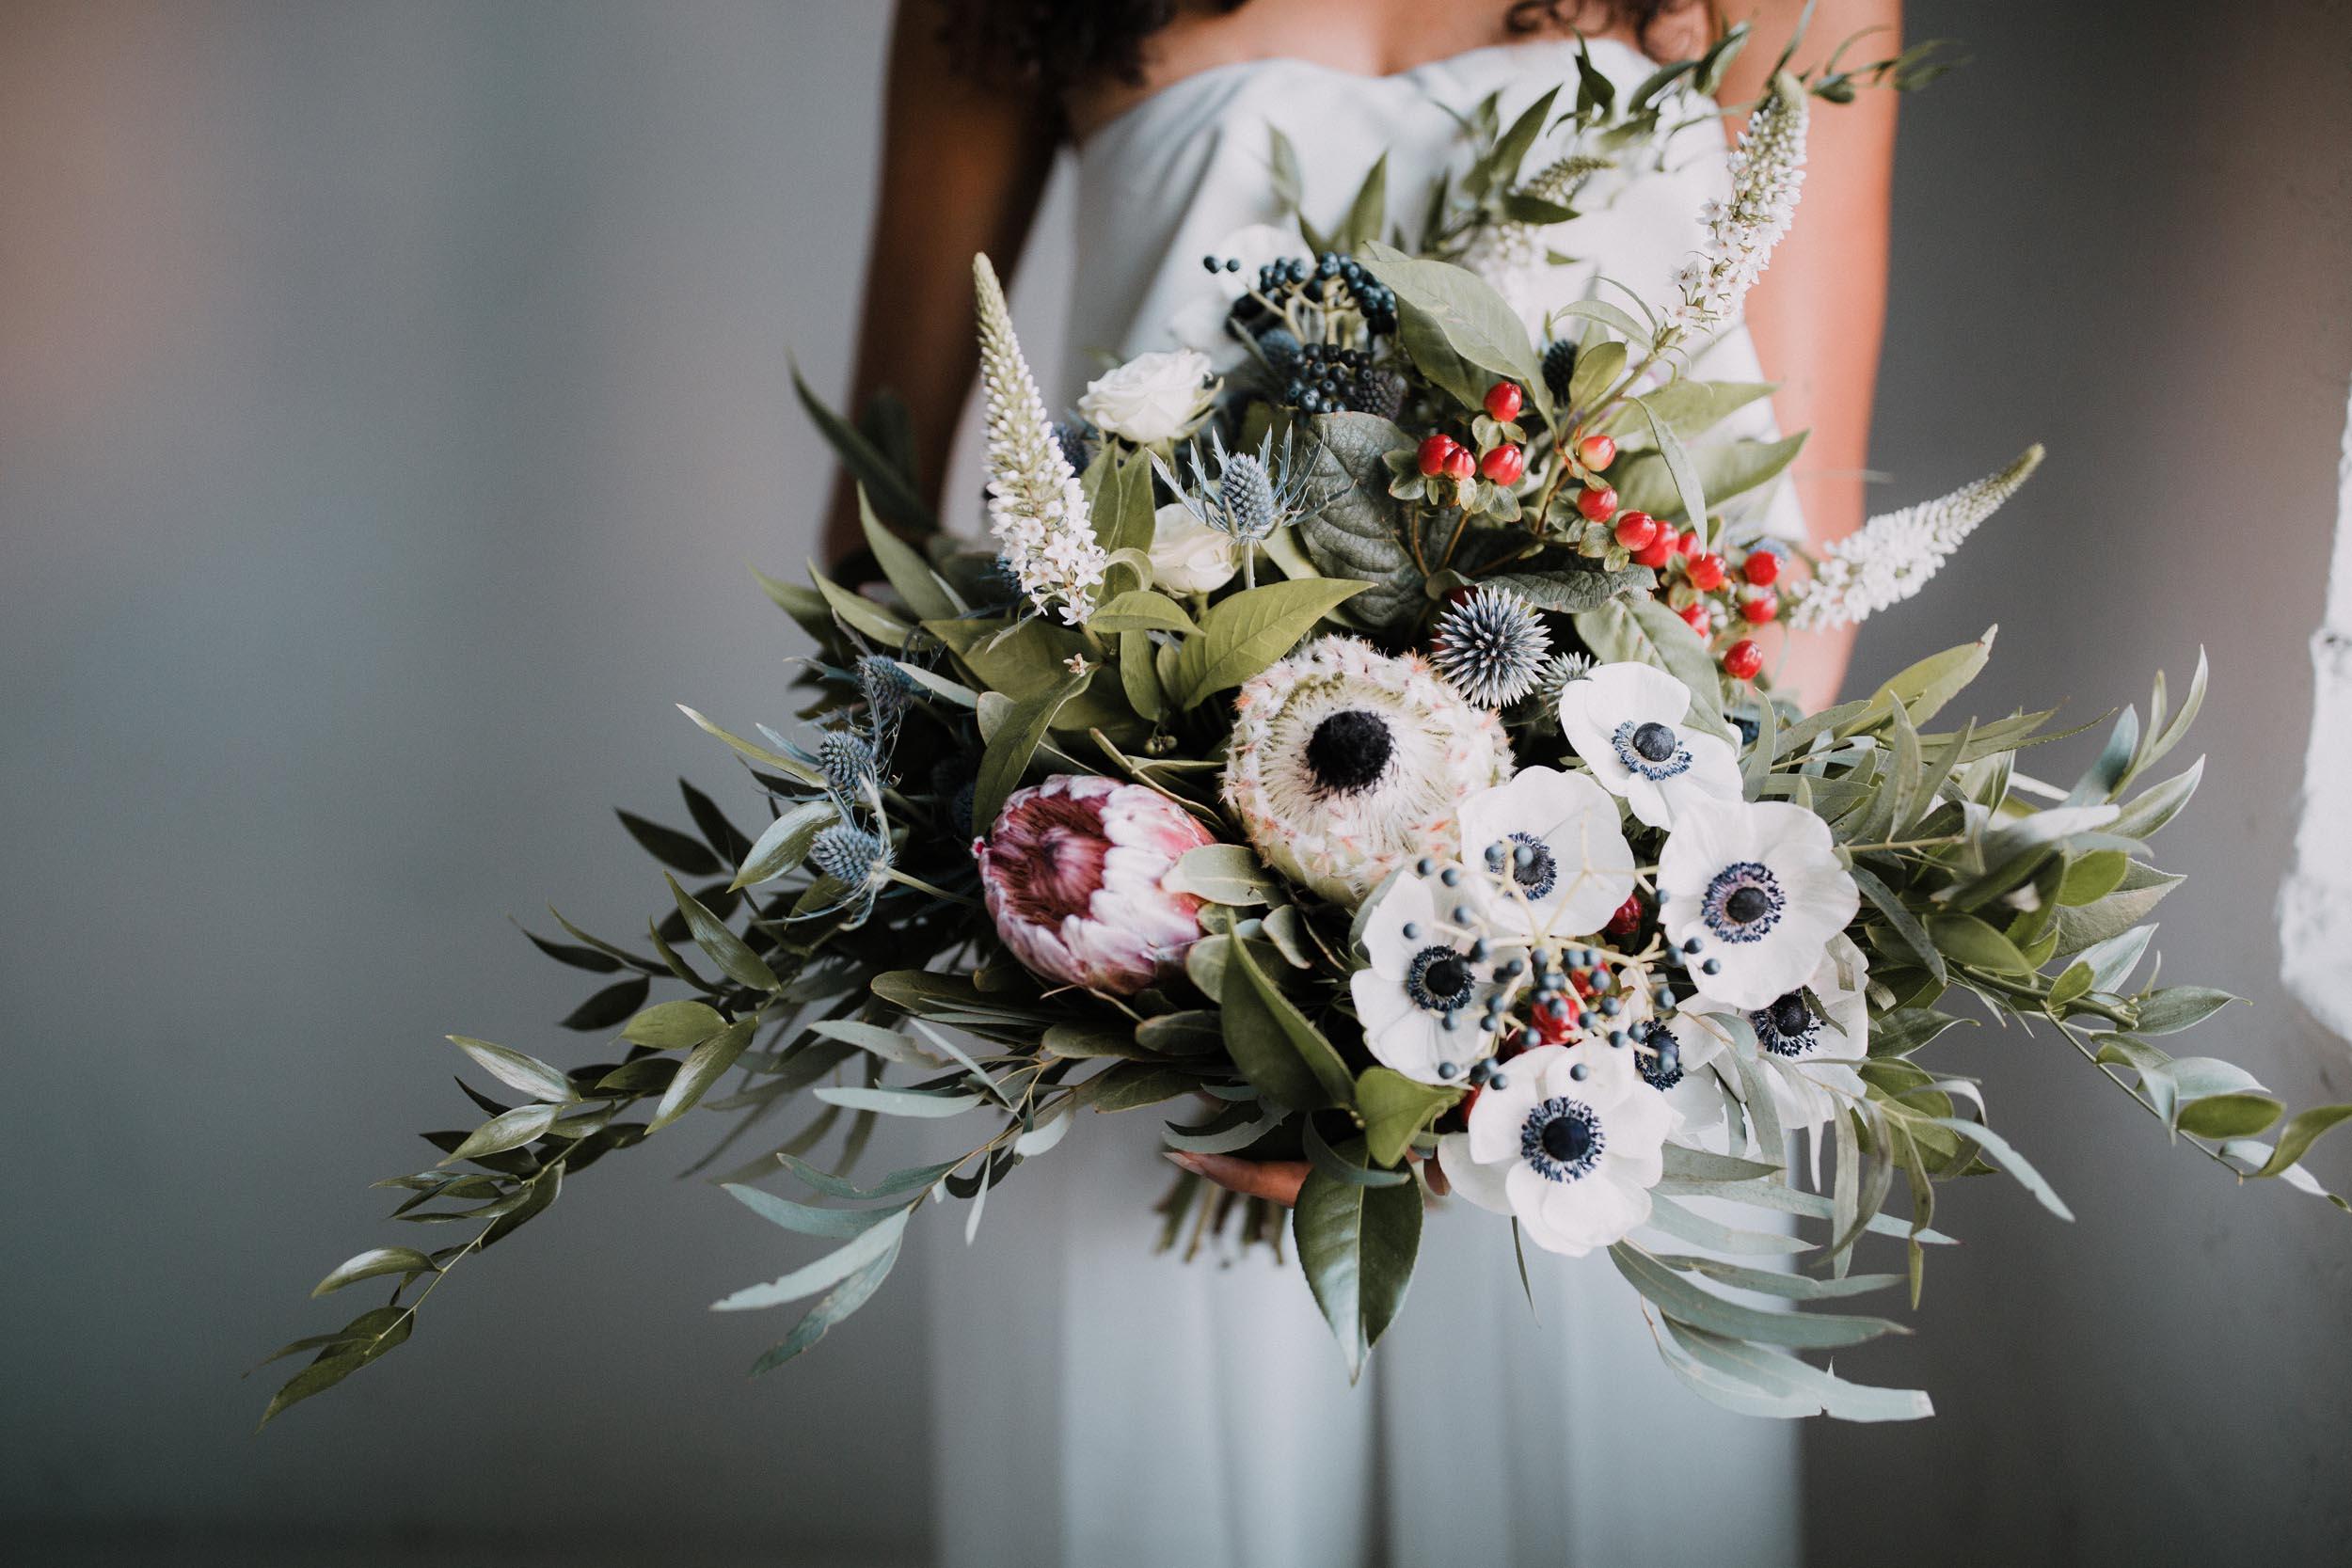 weddings-starsstripes-11.jpg